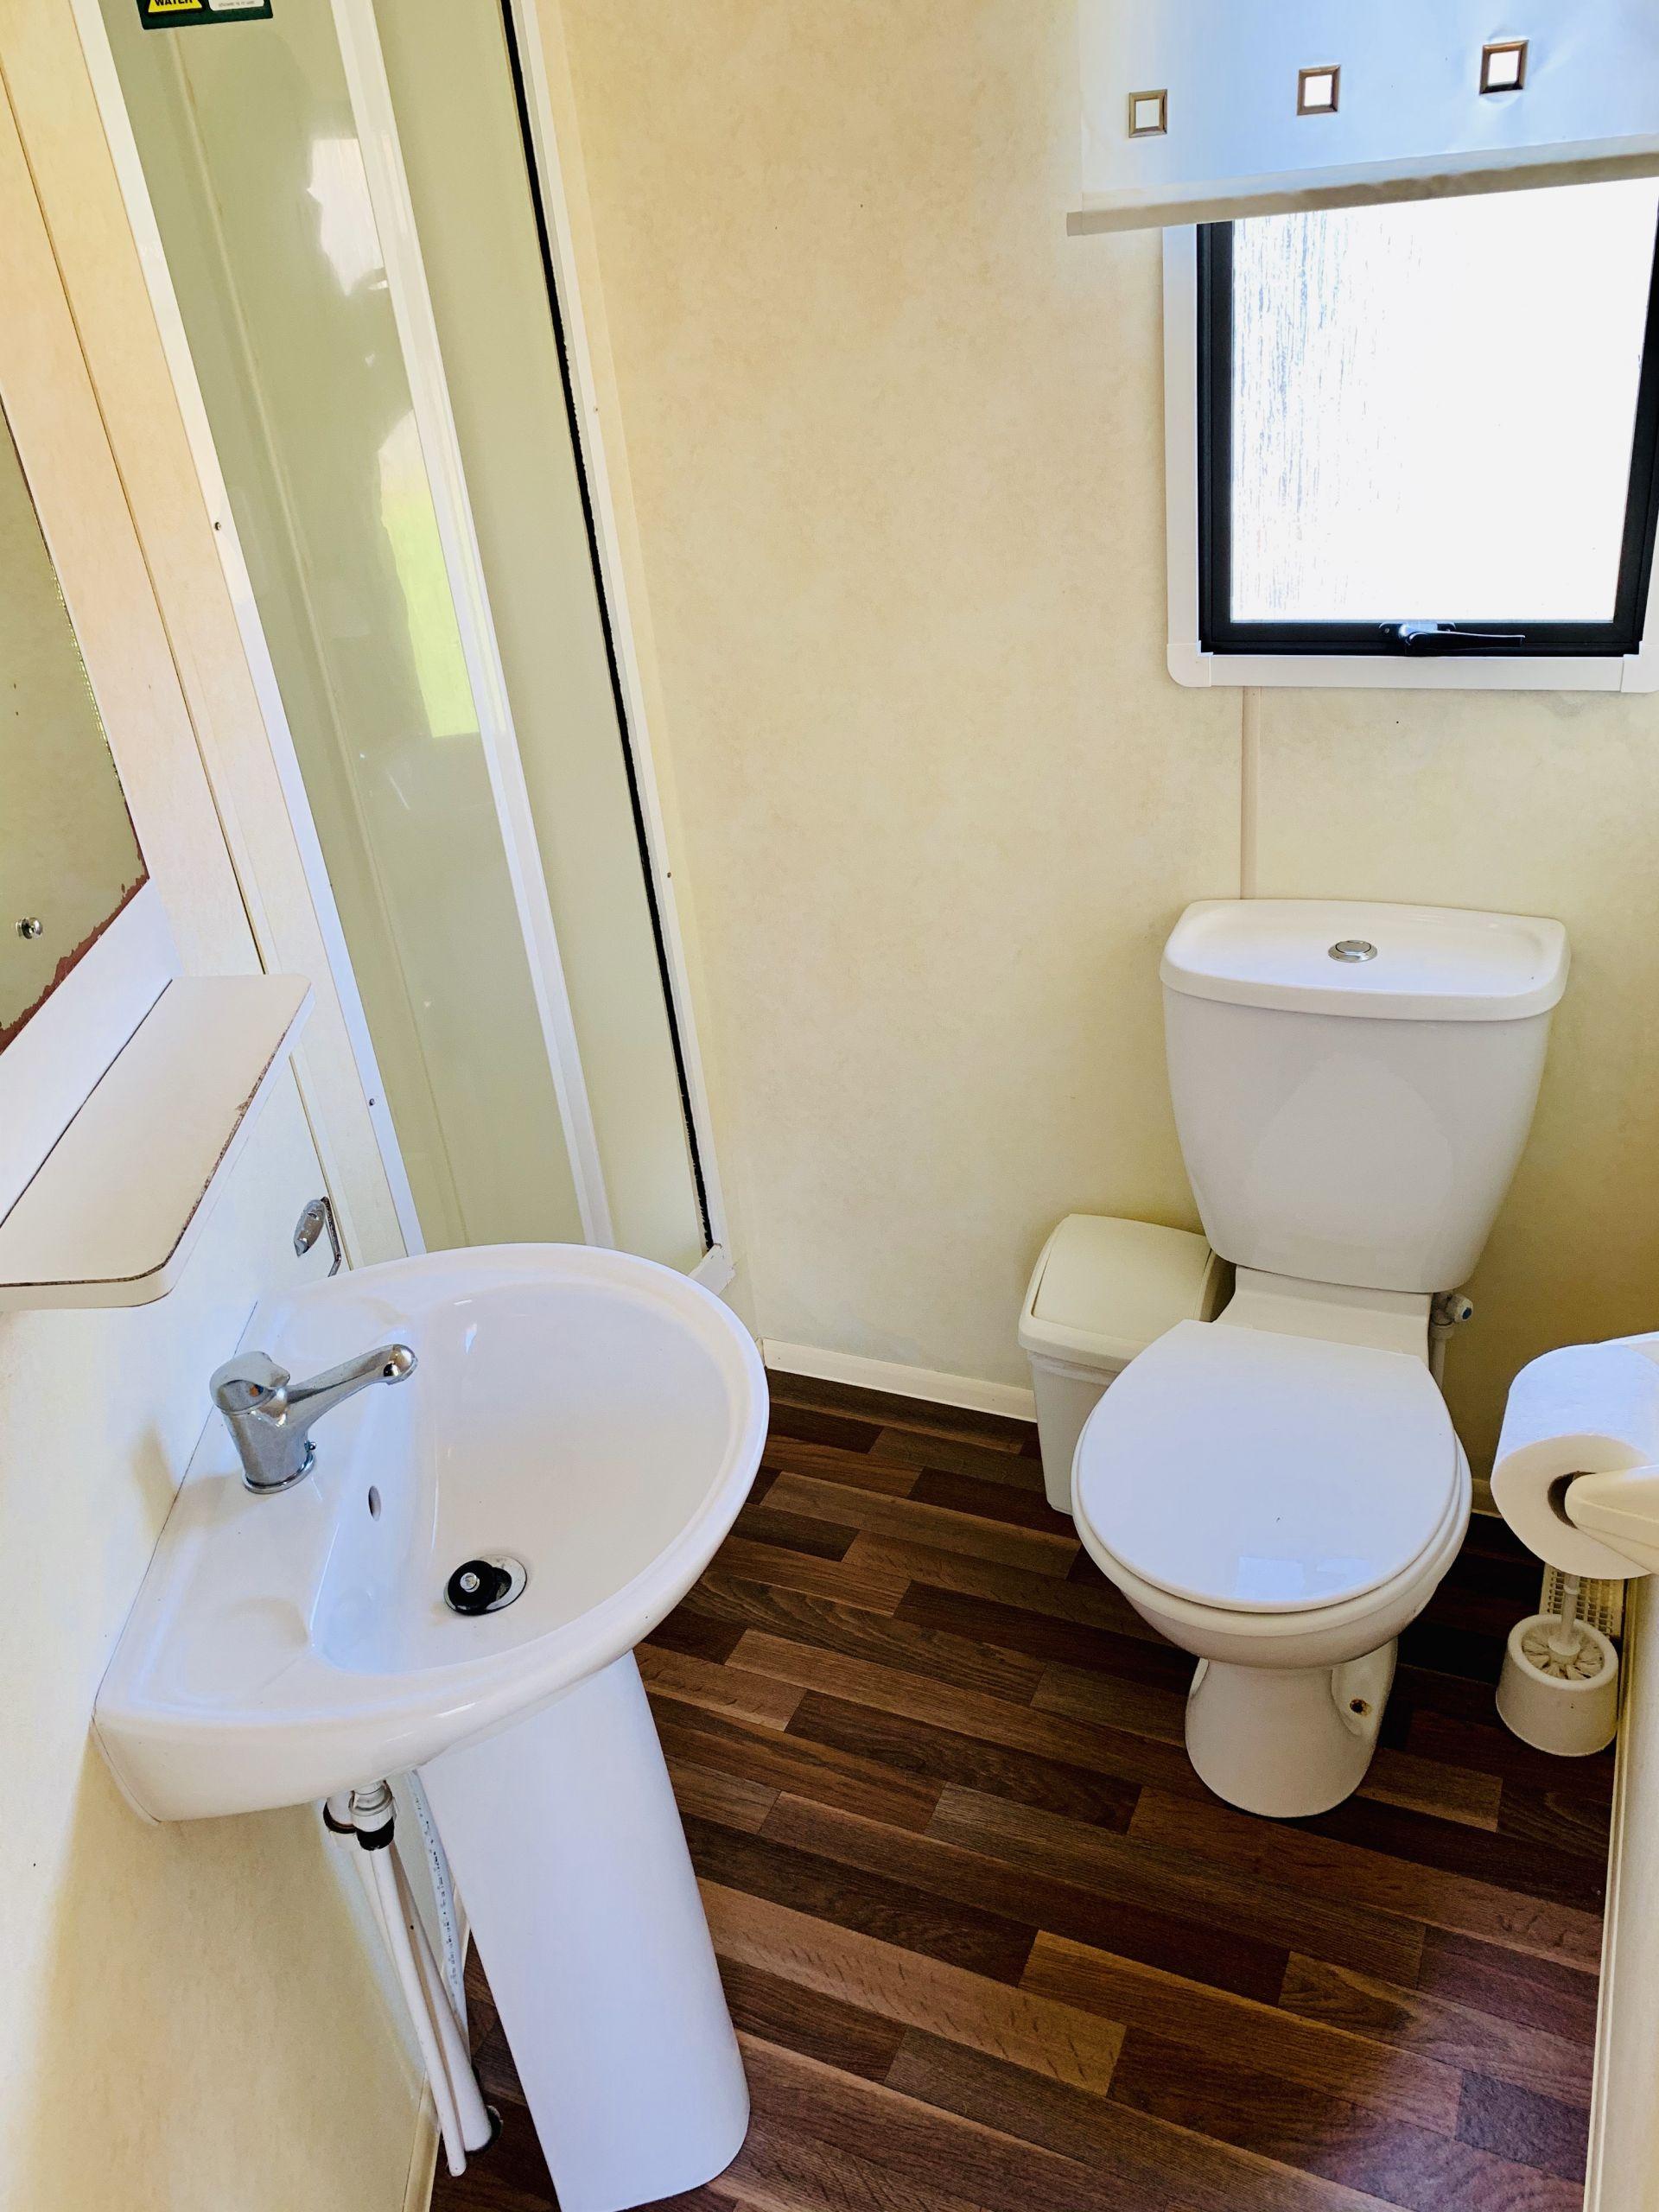 Lamorna hoilday home. toilet , Roselands caravan park St Just